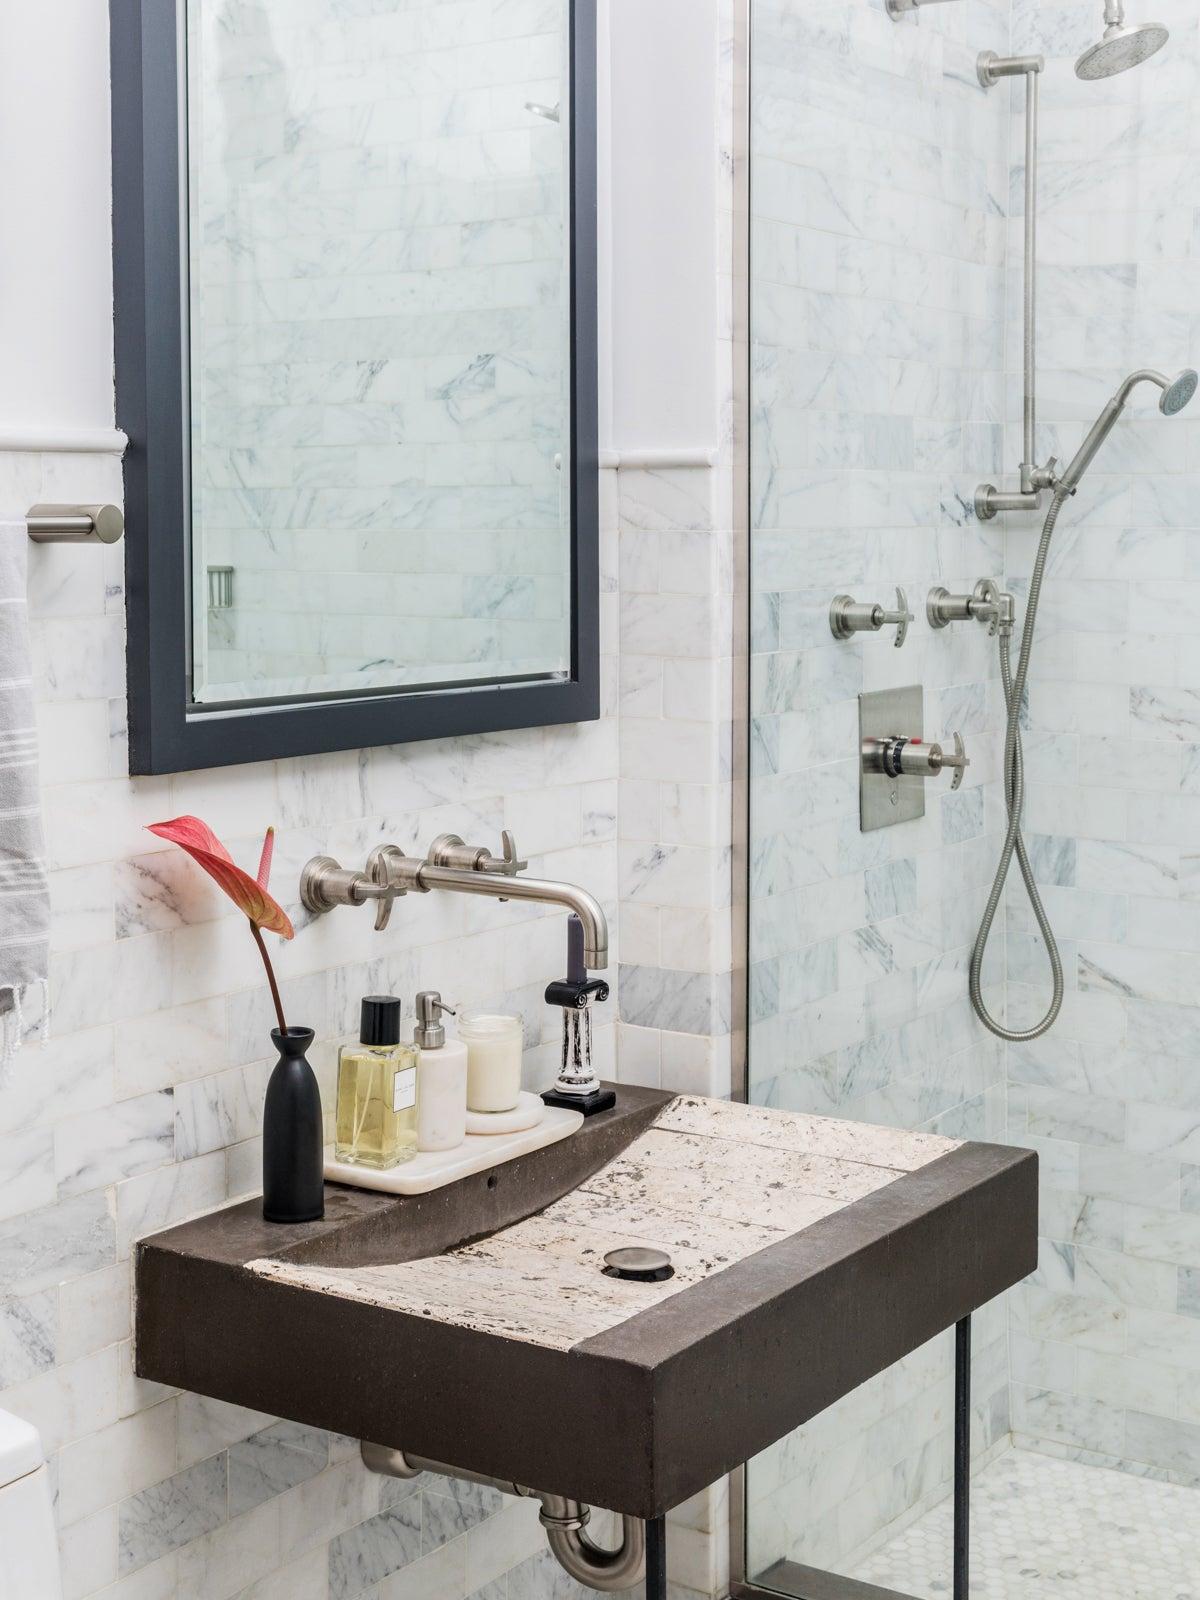 Simple bathroom sink with anthurium in vase